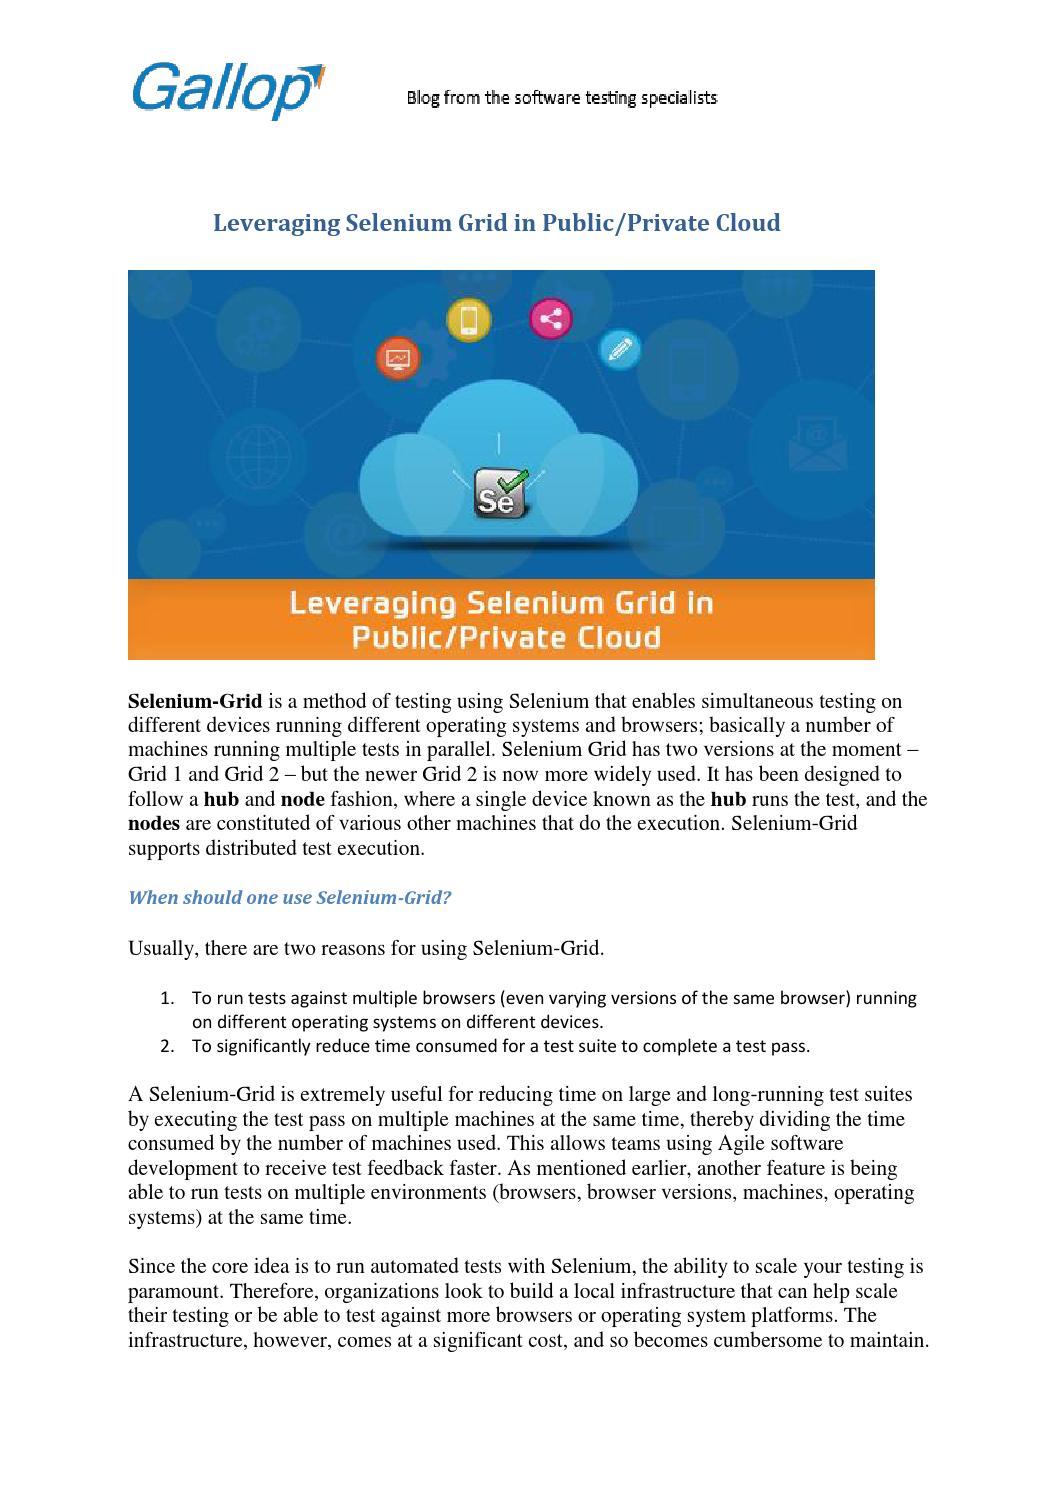 Leveraging Selenium Grid in Public/Private Cloud by Gallop